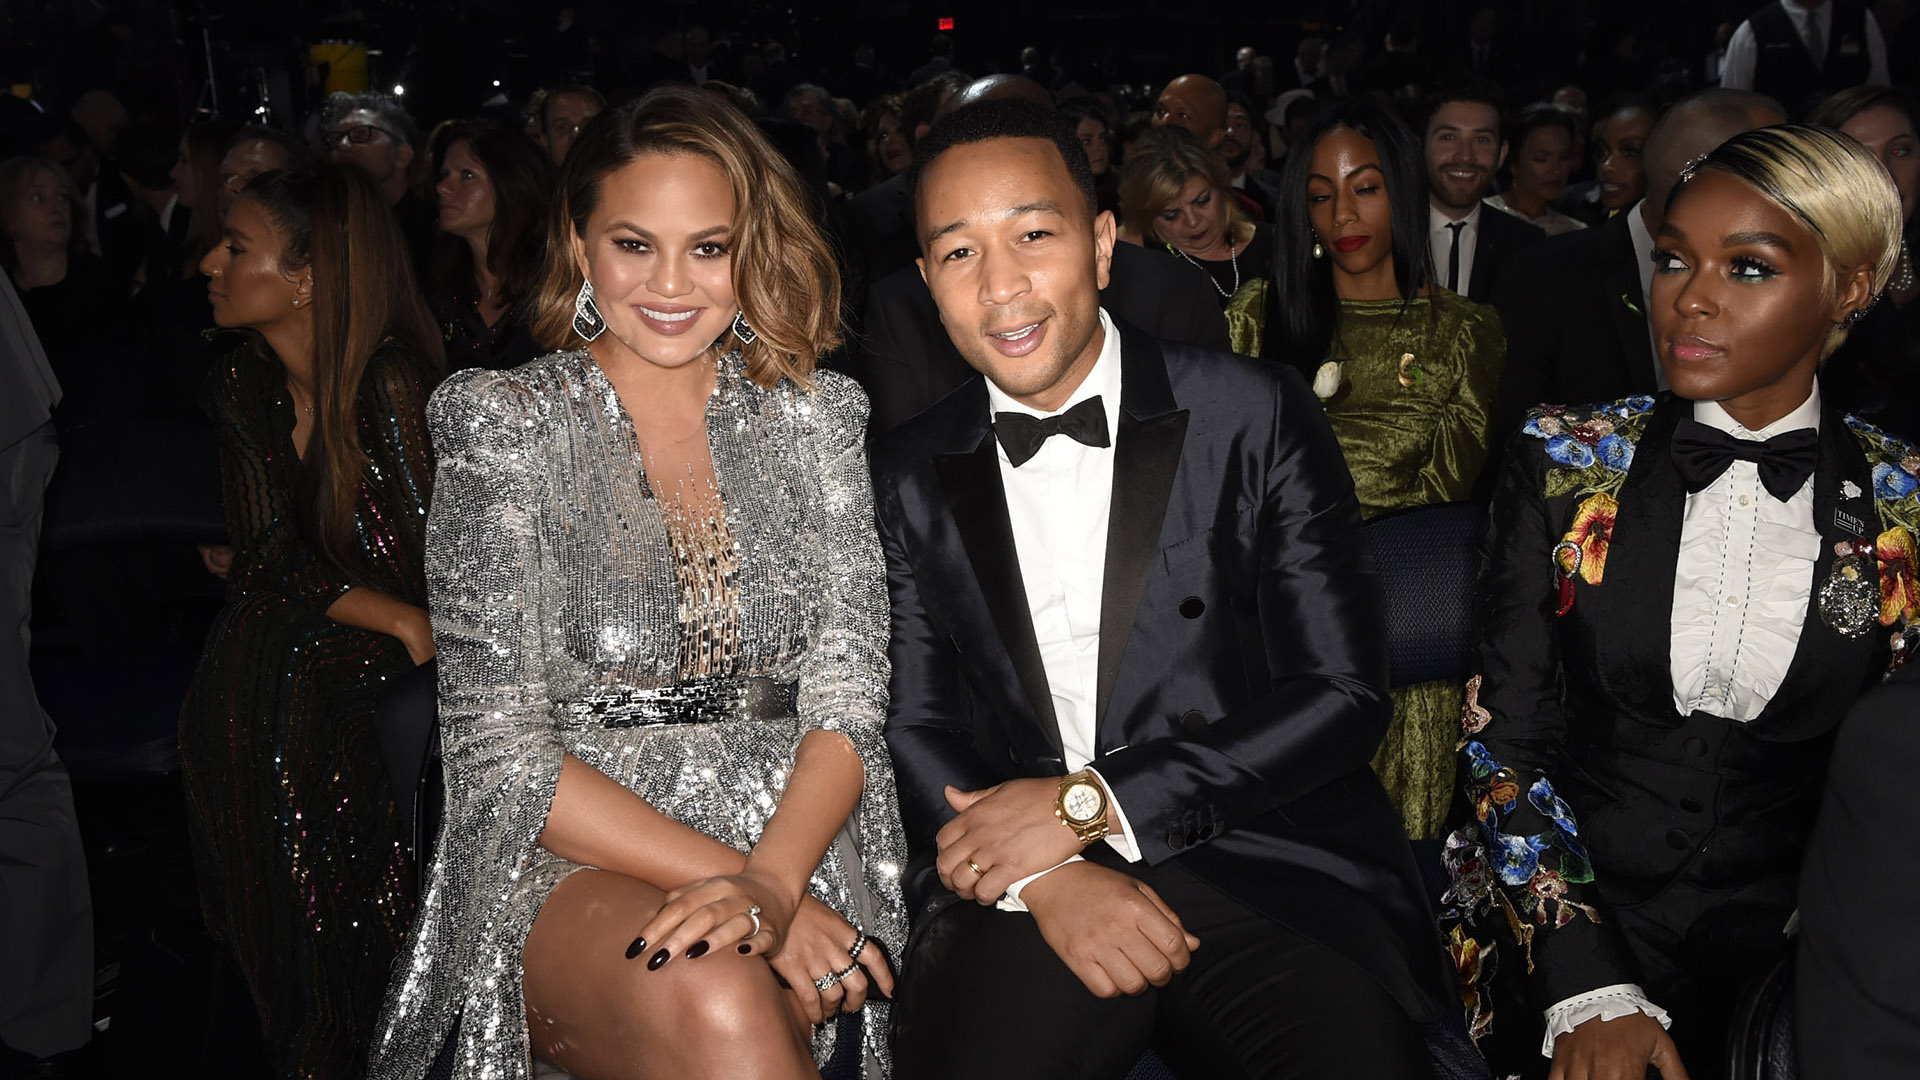 Soul-pop crooner John Legend offers a smile for the camera alongside wife Chrissy Teigen, while Janelle Monáe looks on.